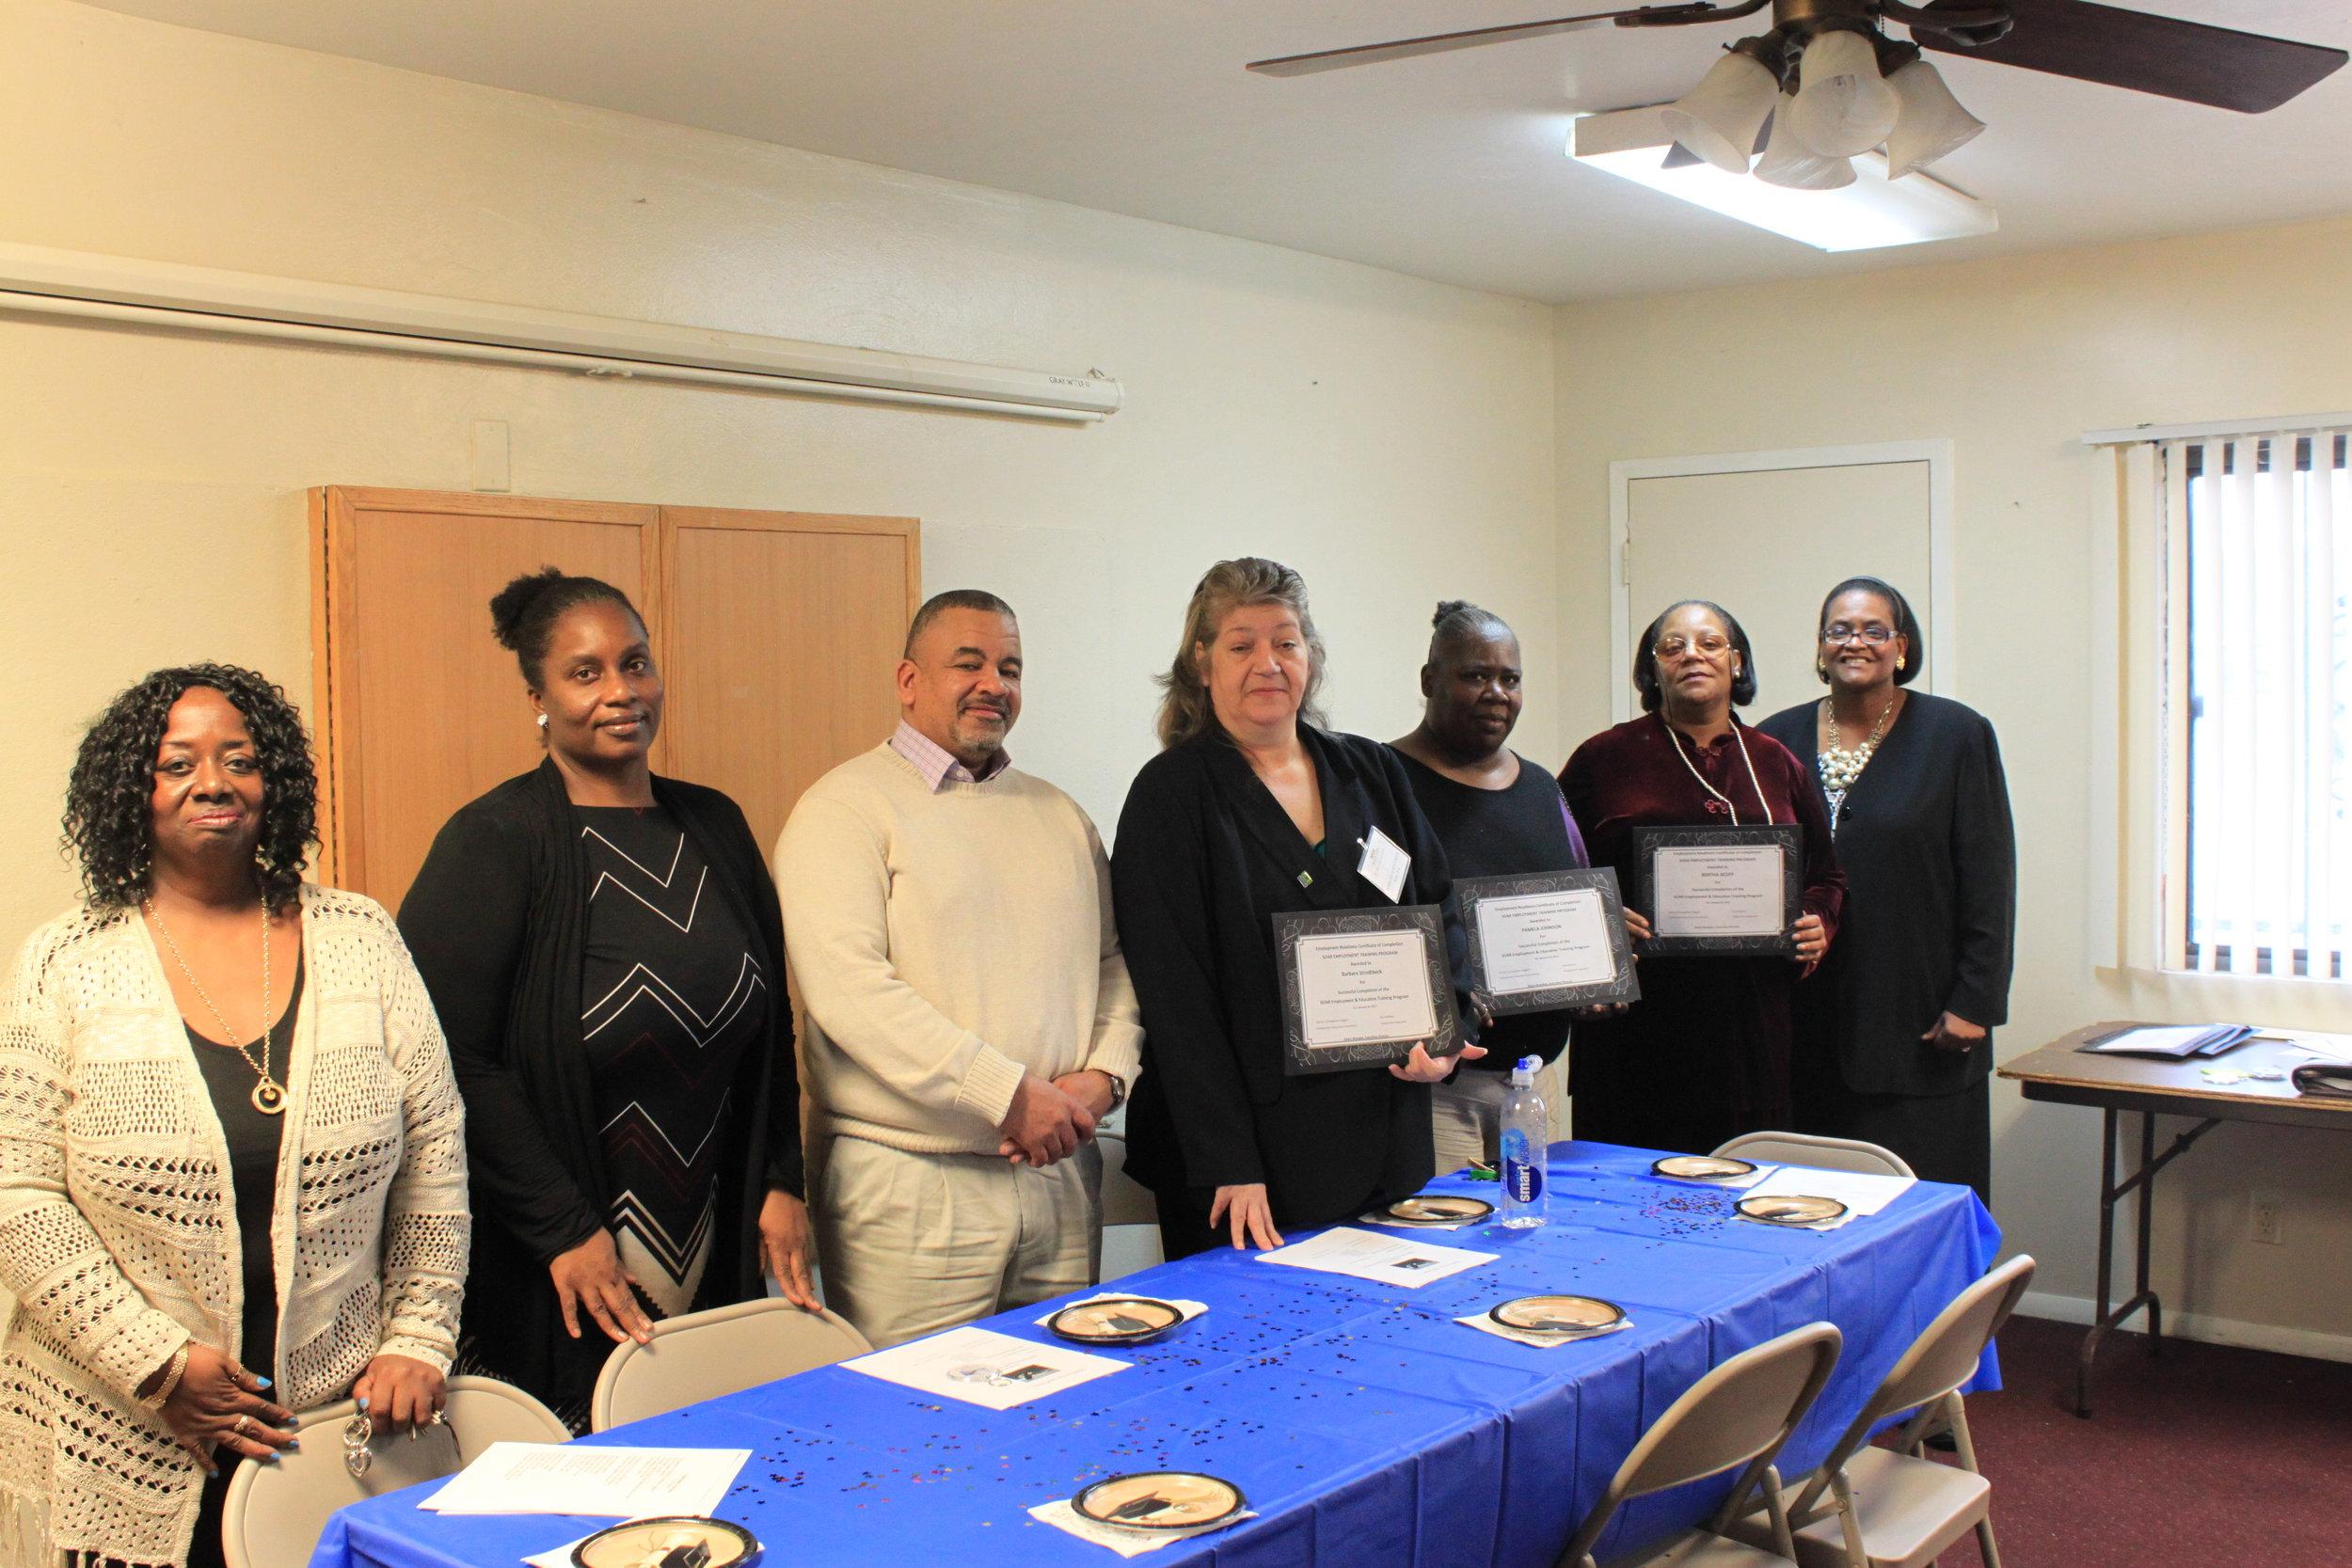 Graduation Class and Instructors, January 25, 2017